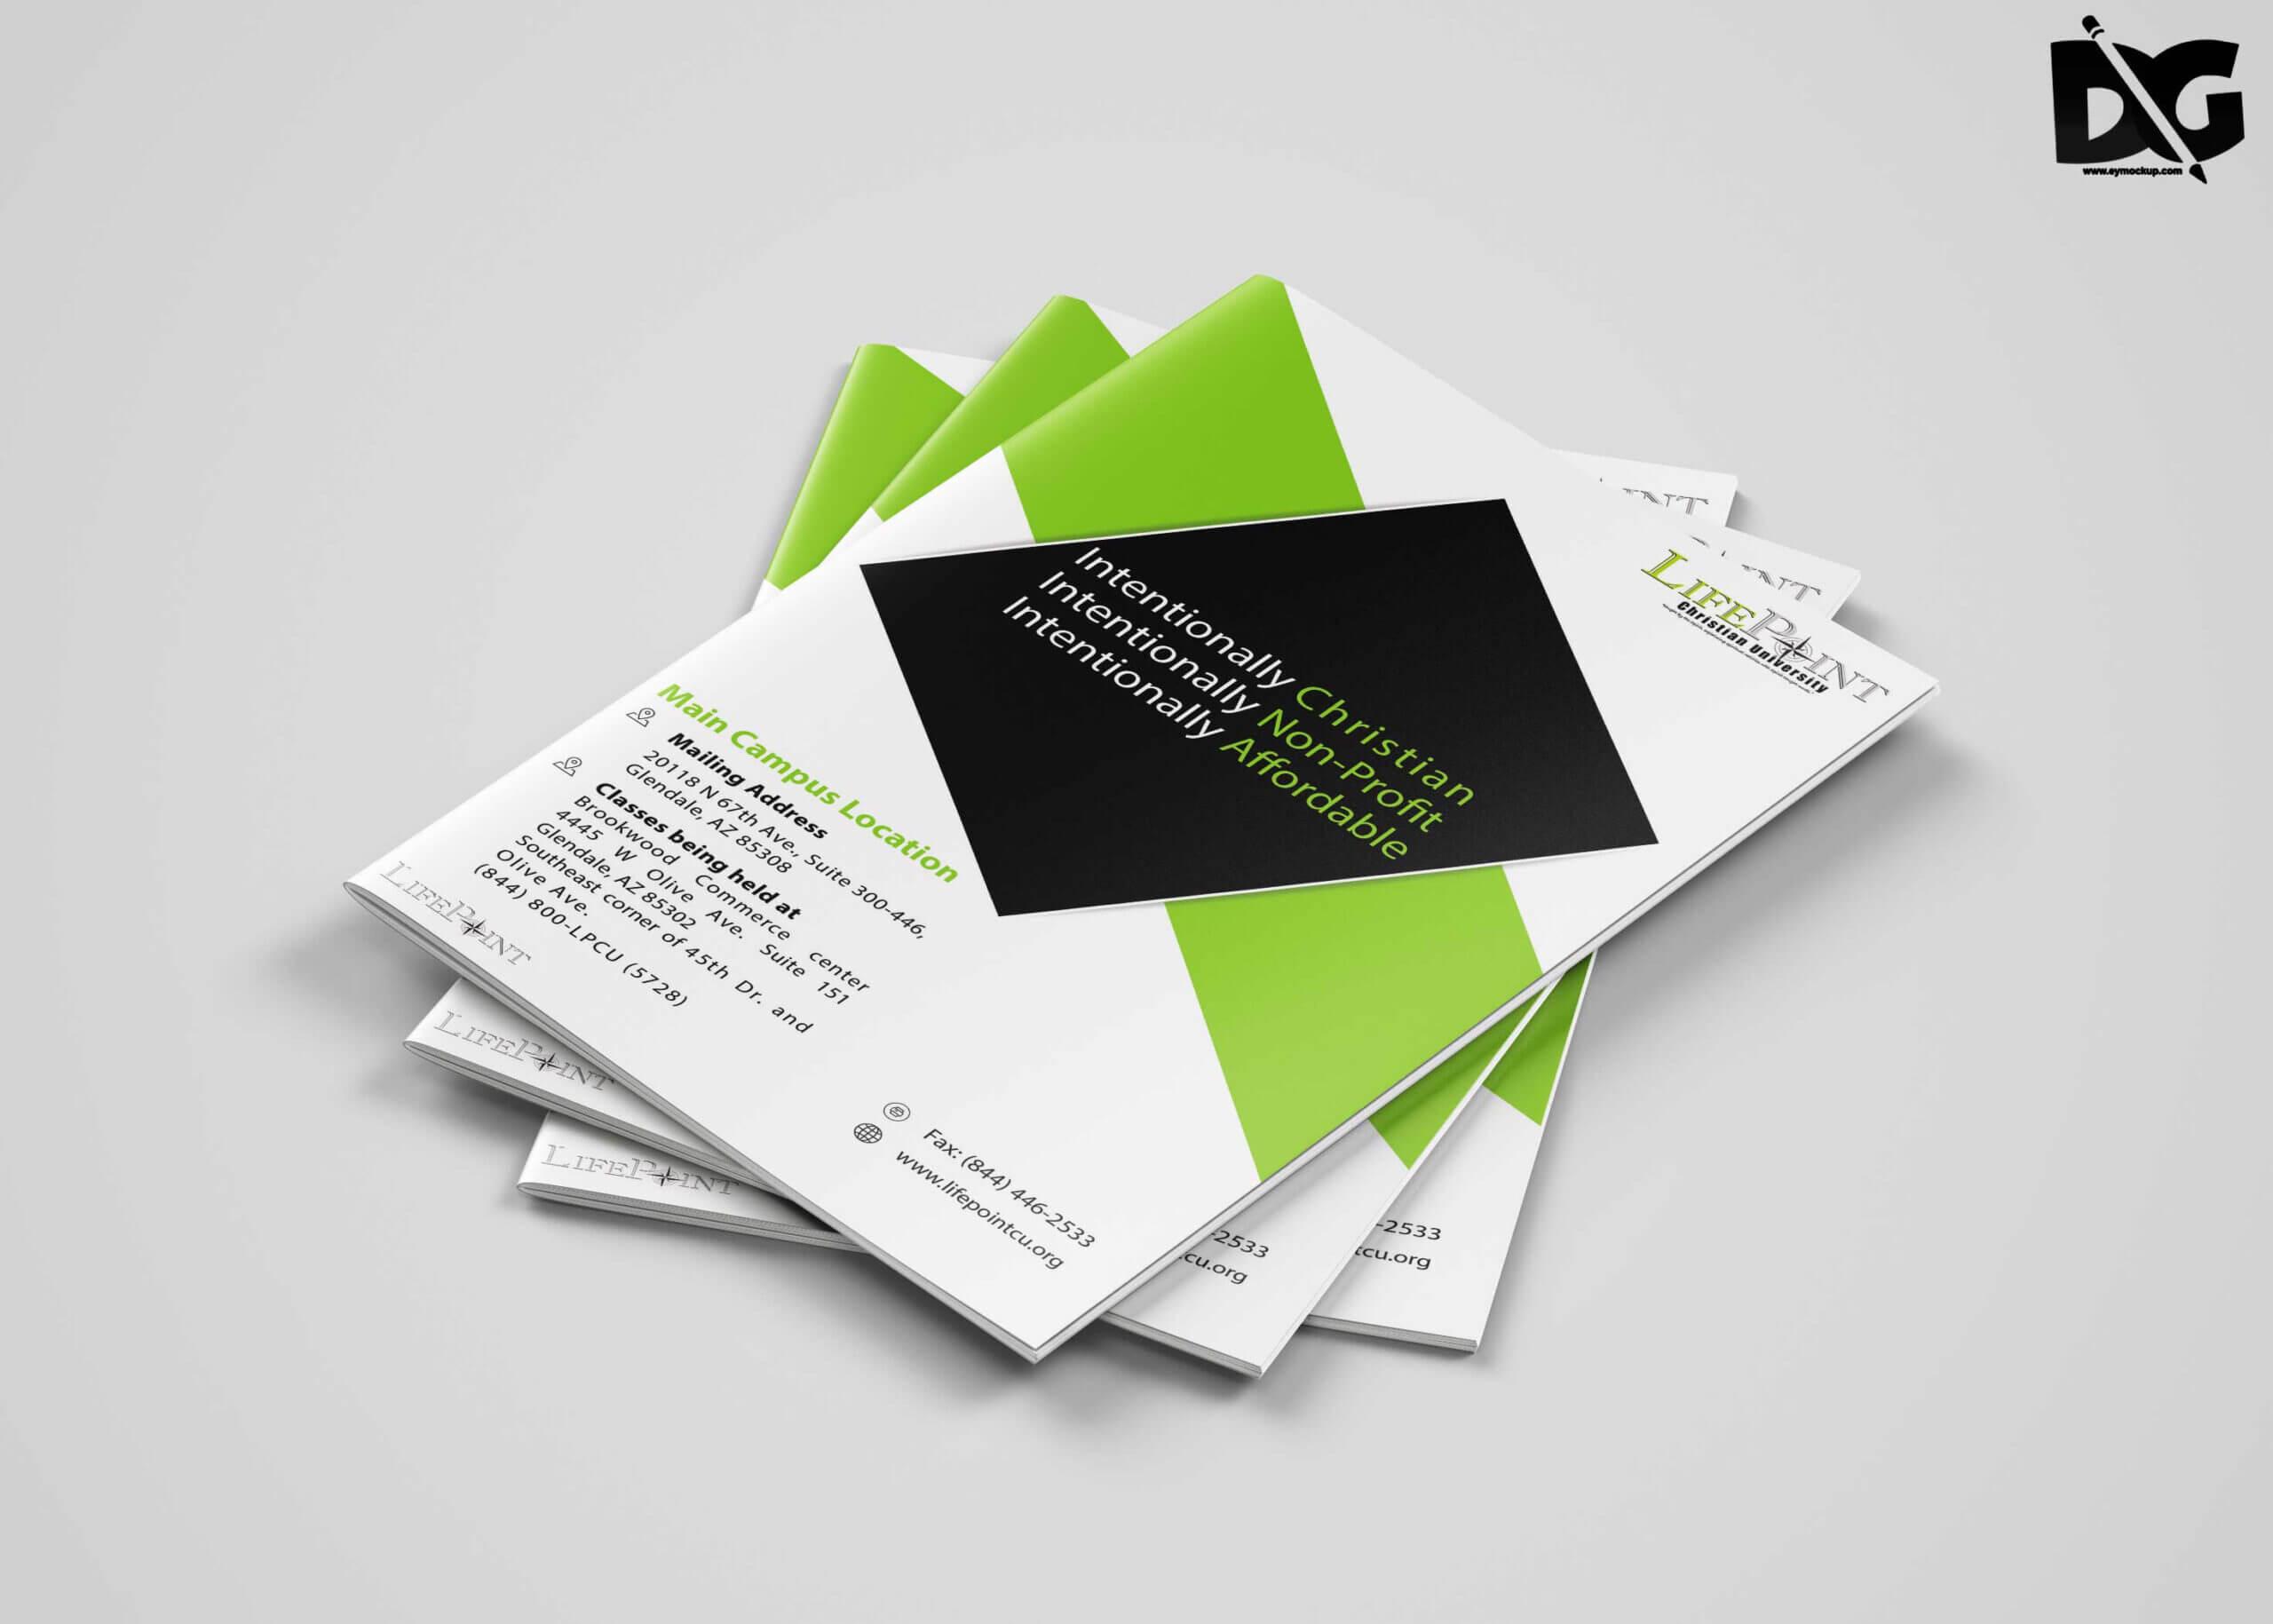 Bi Fold Brochure Template Free Download - Yatay For Two Fold Brochure Template Psd